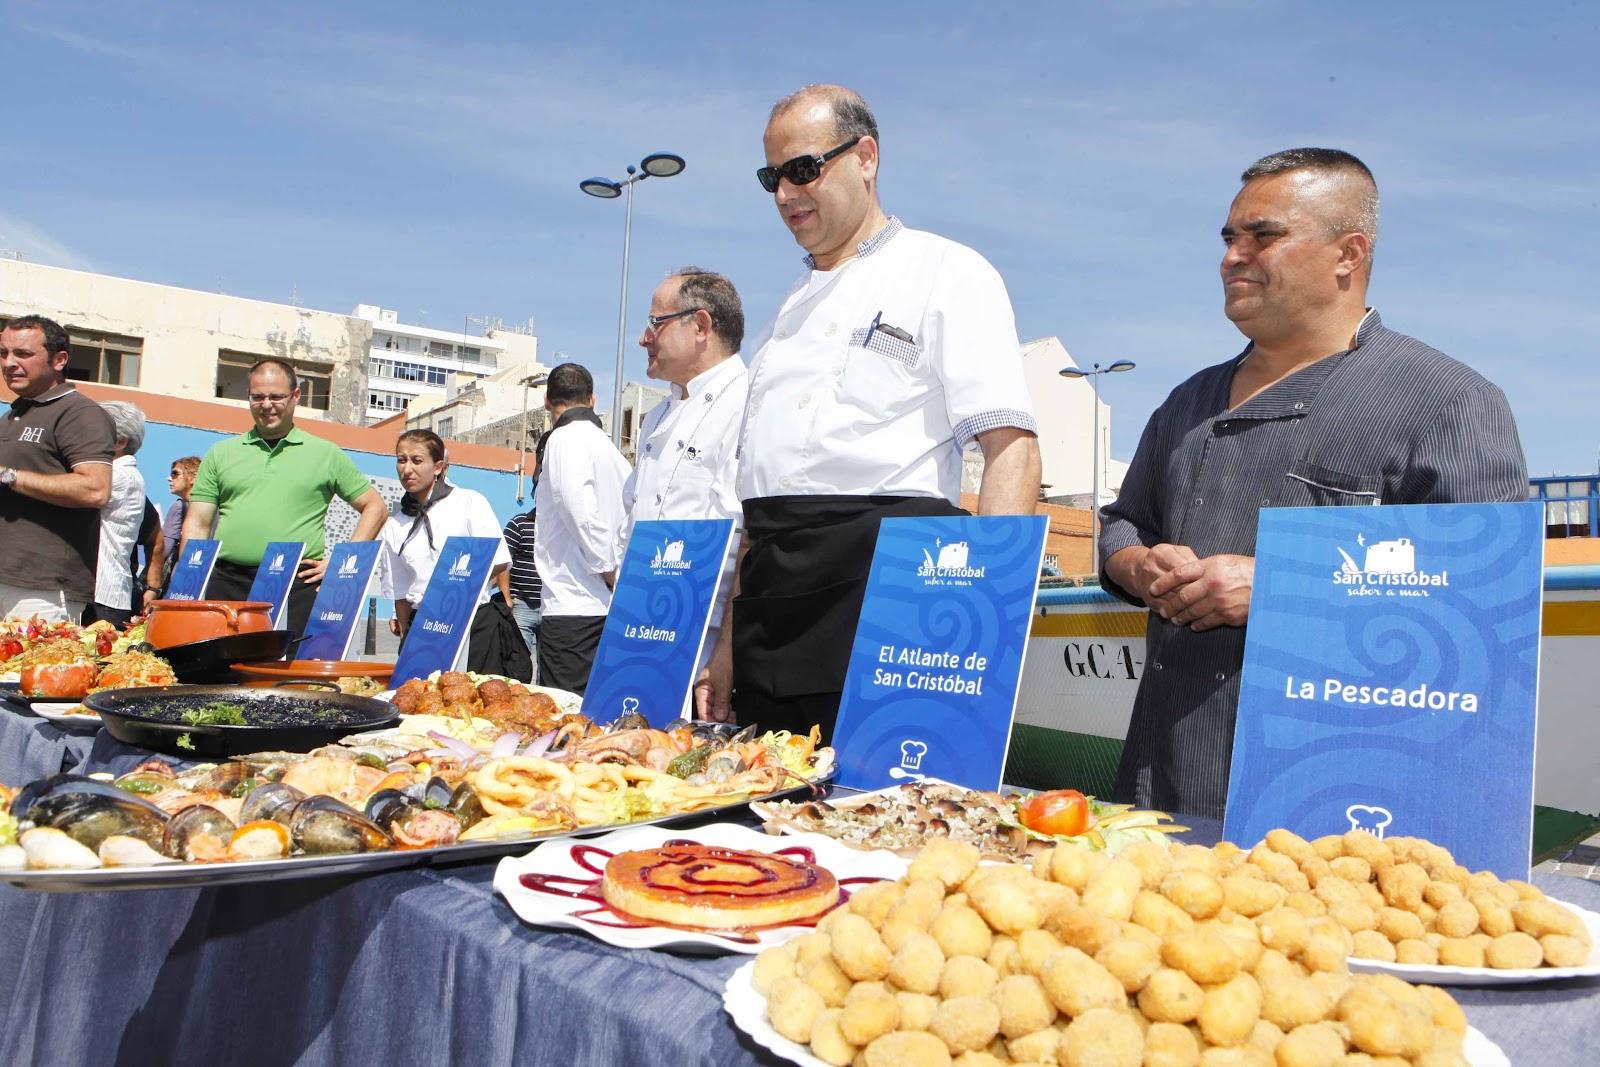 San crist bal acoge el 1er festival gastron mico sabor a mar - Gran canaria tv com ...